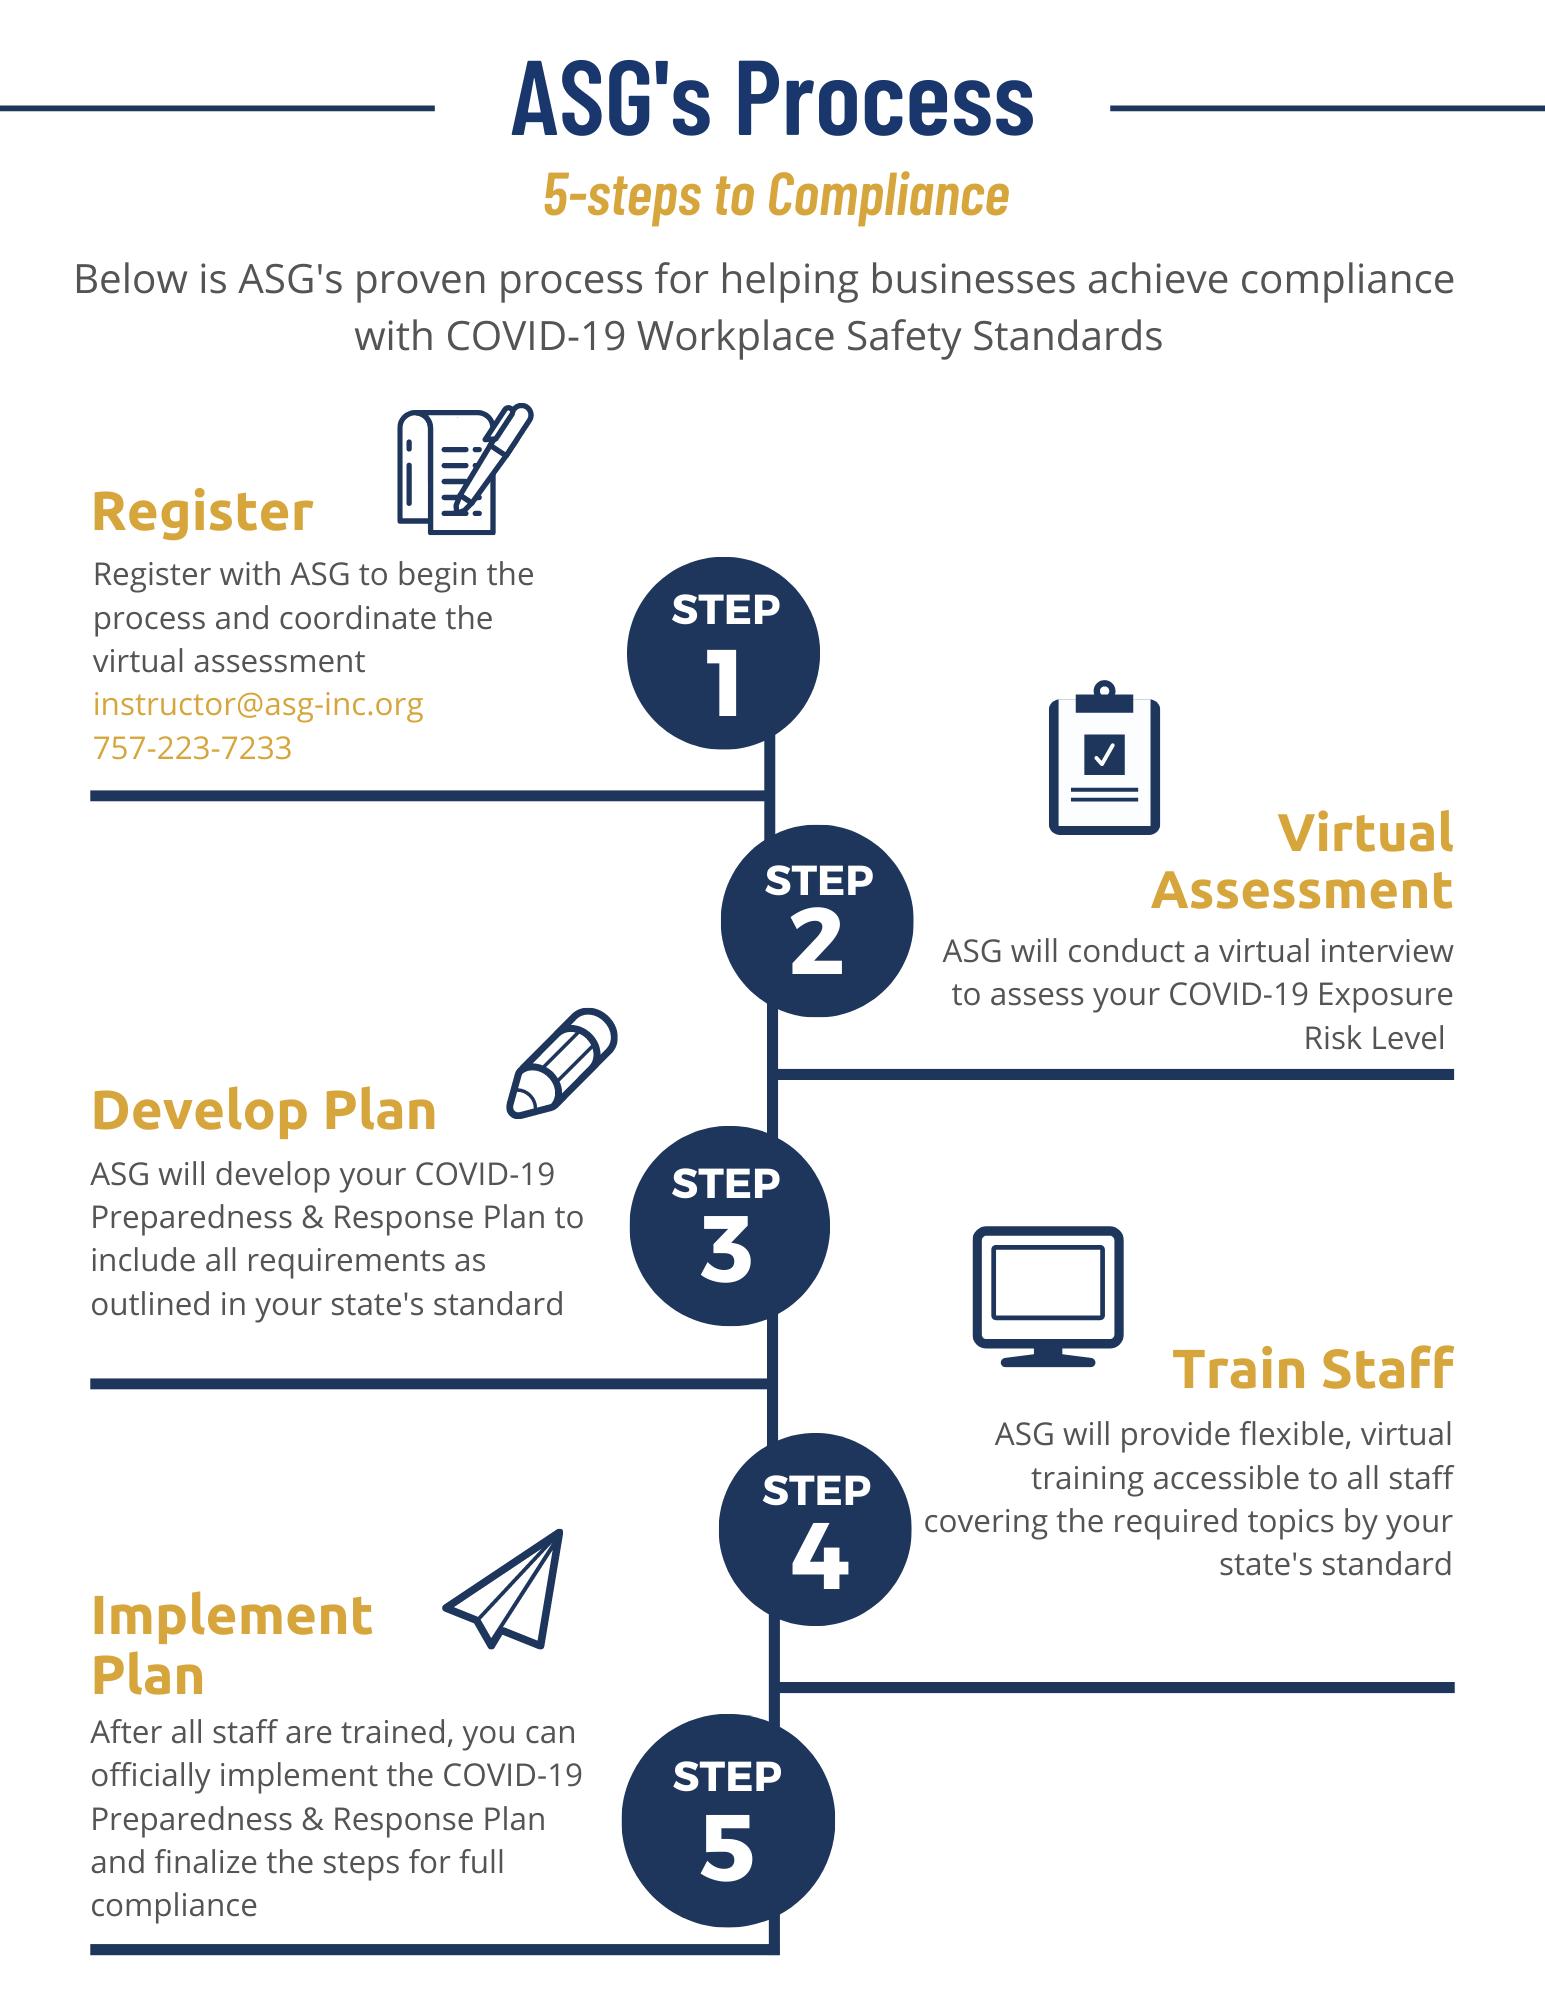 ASGs-5-Step-Compliance-Process